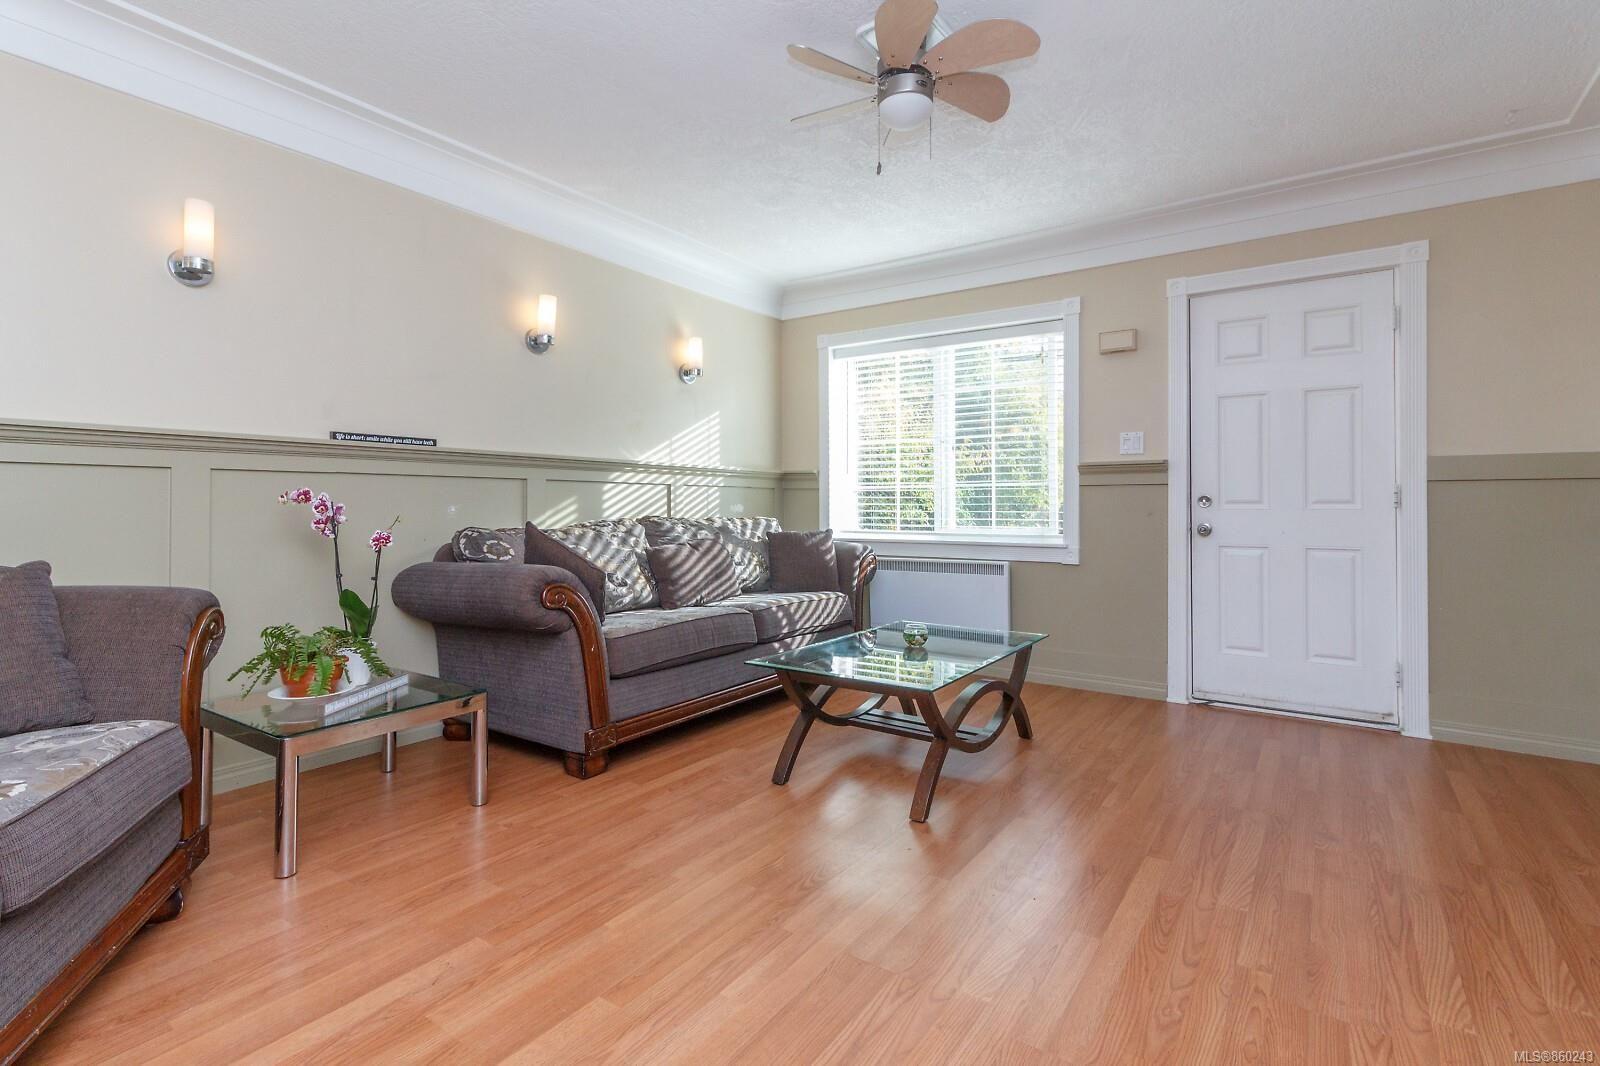 Main Photo: 24 Lurline Ave in : SW Gateway House for sale (Saanich West)  : MLS®# 860243